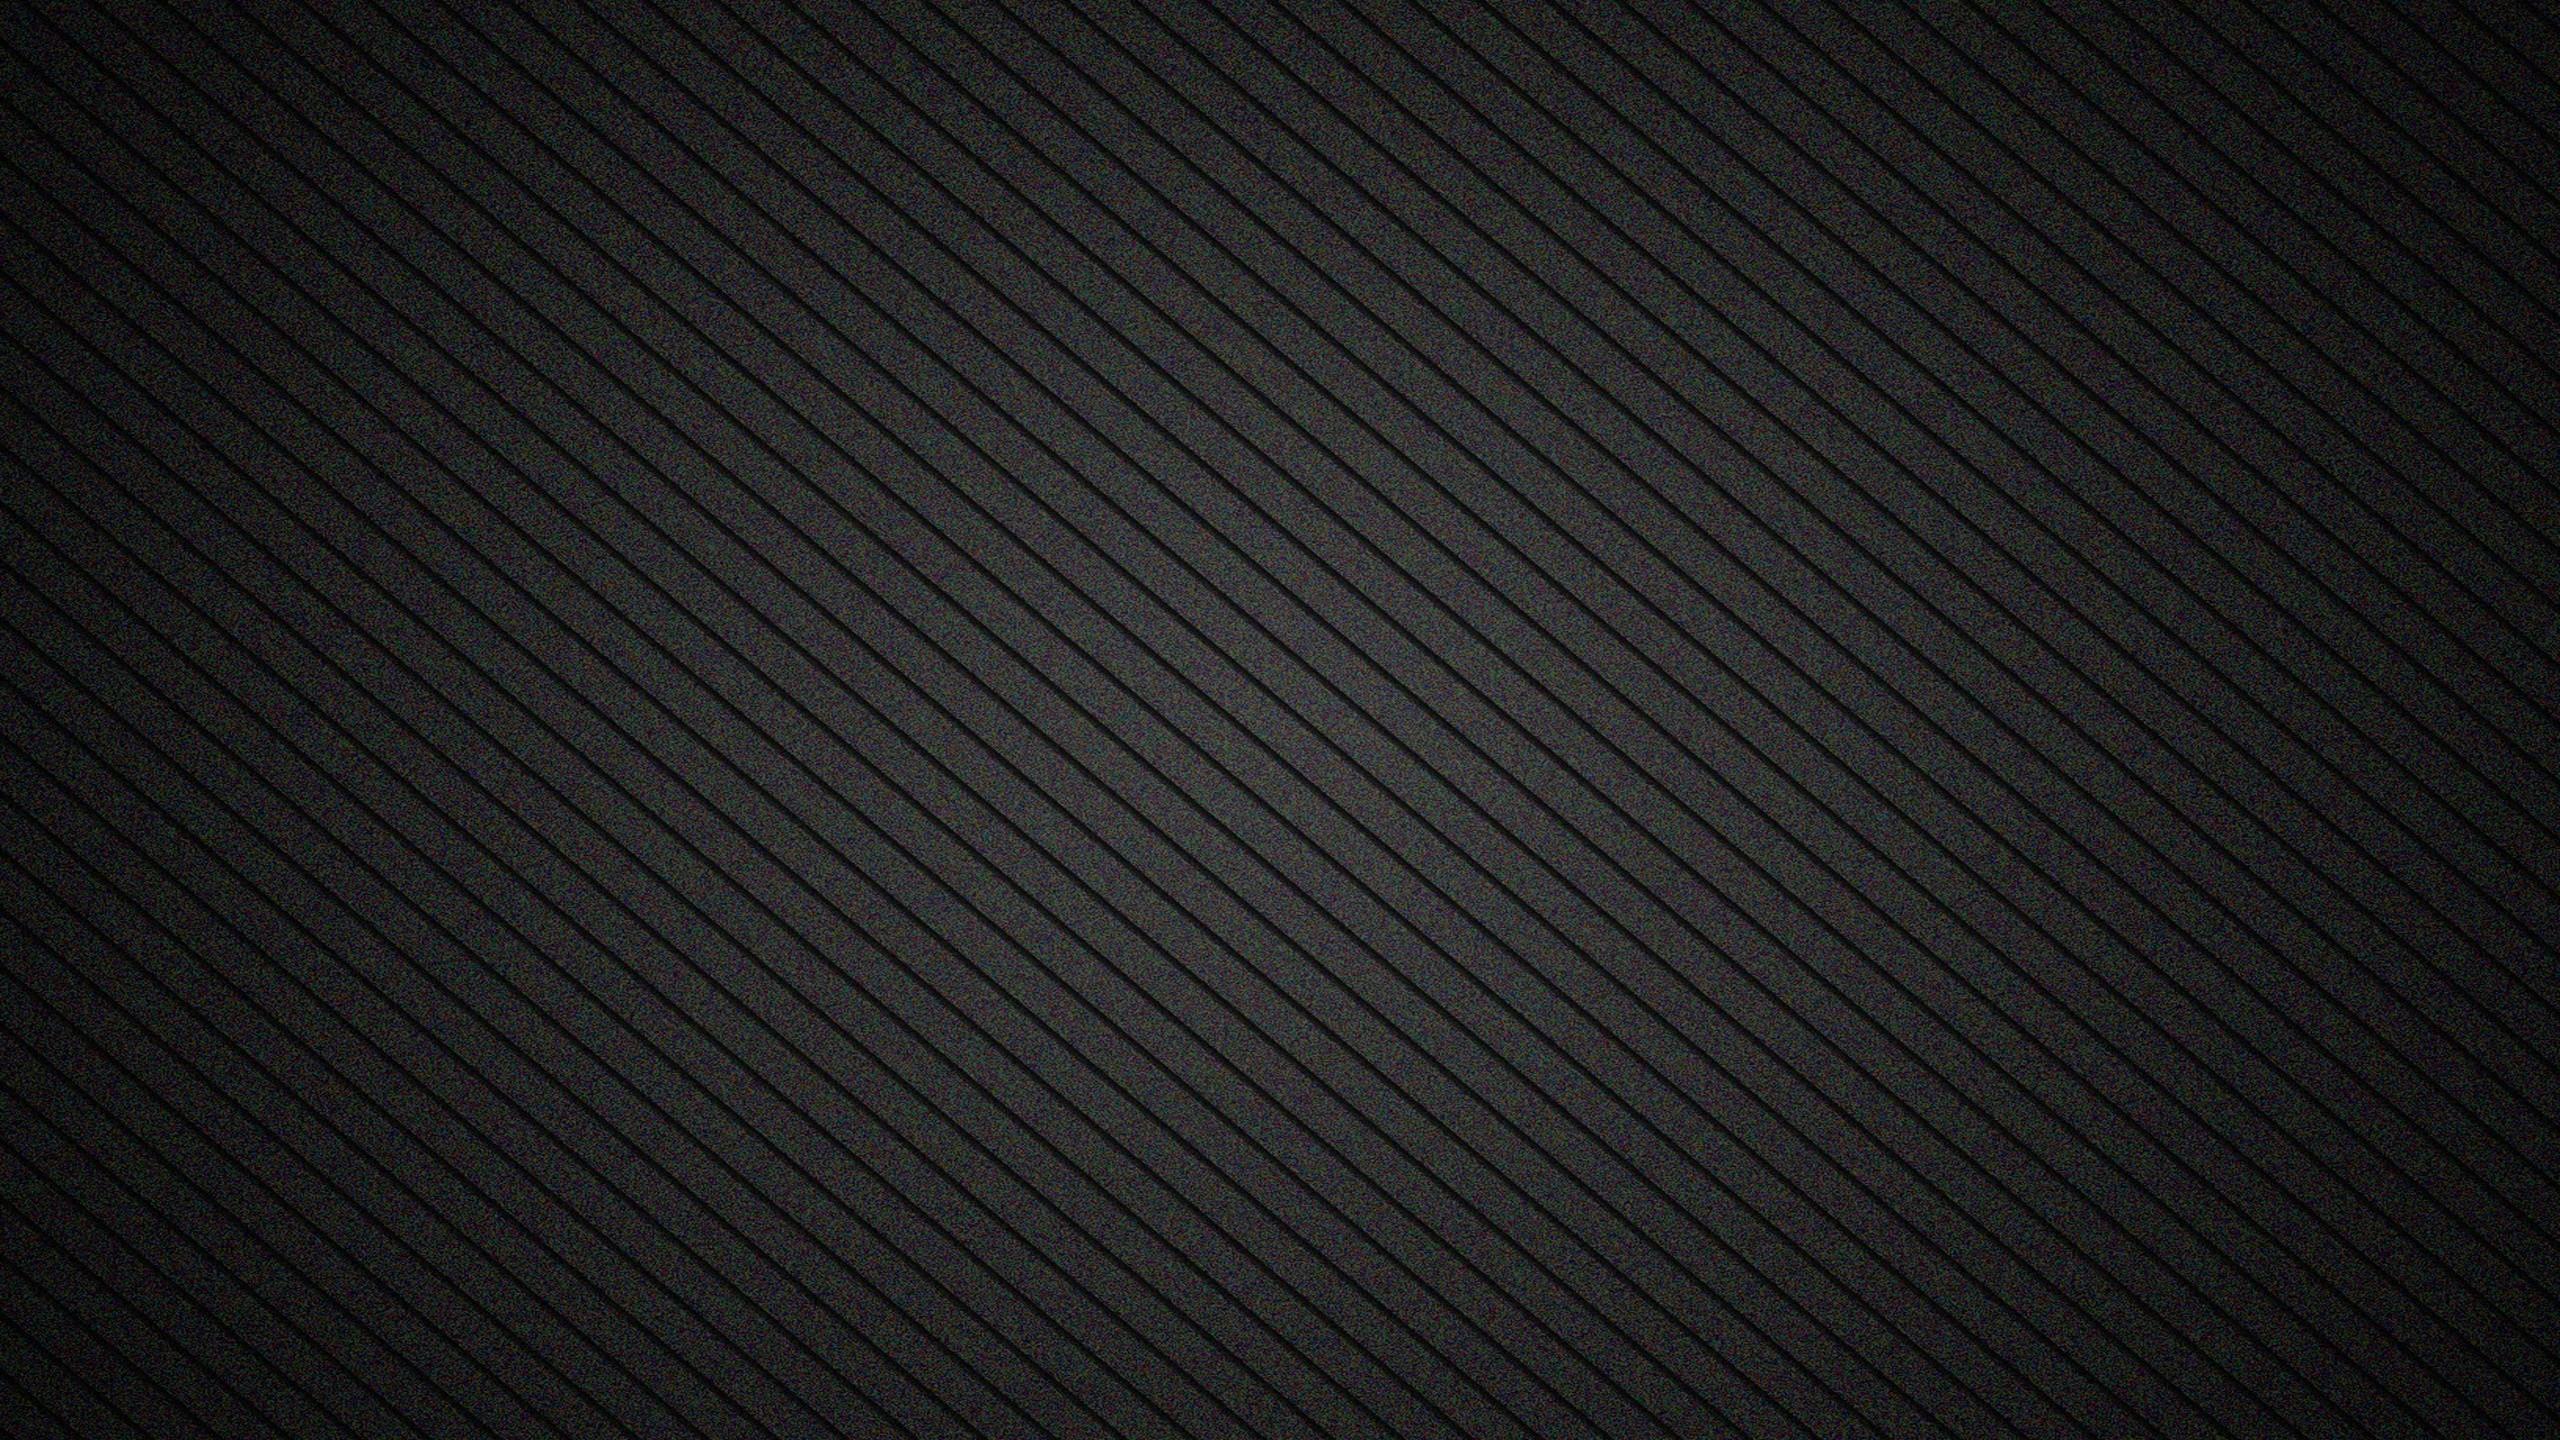 2560 X 1440 Wallpaper Black (94+ Images